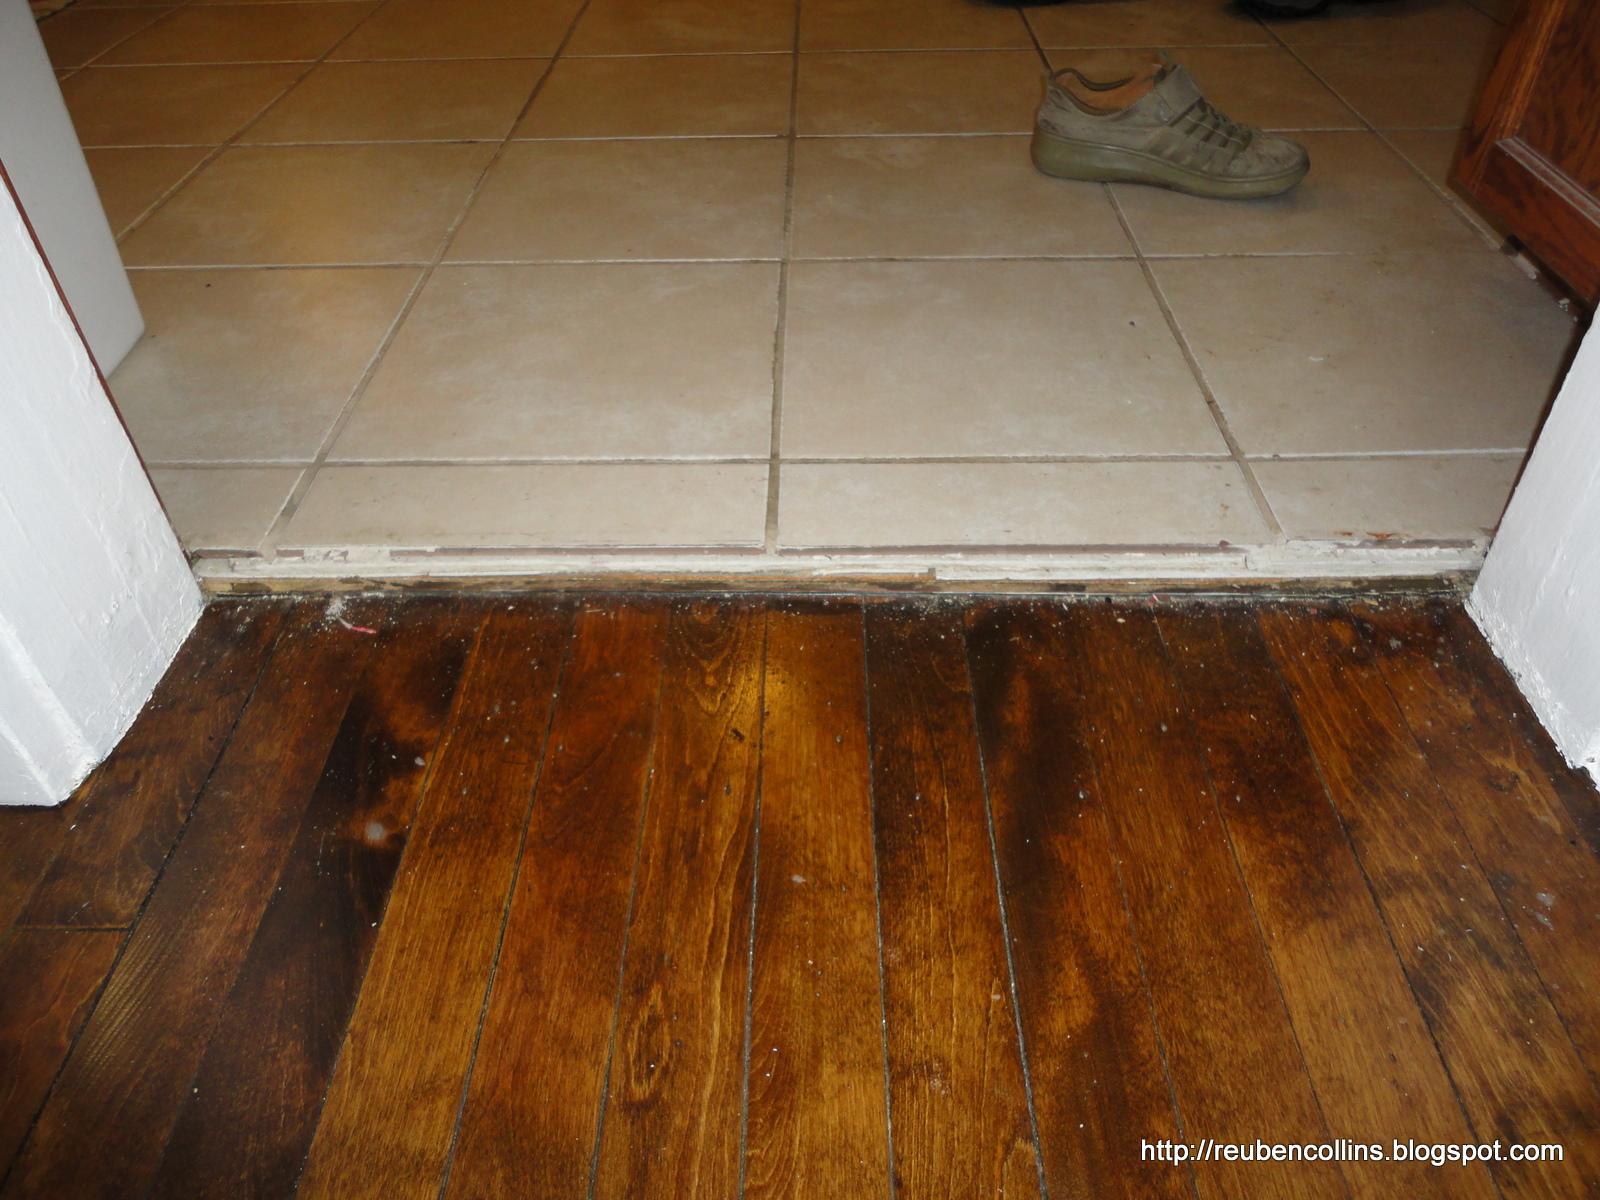 Kitchen flooring next to hard wood floors wood floors for Wood floor next to tile